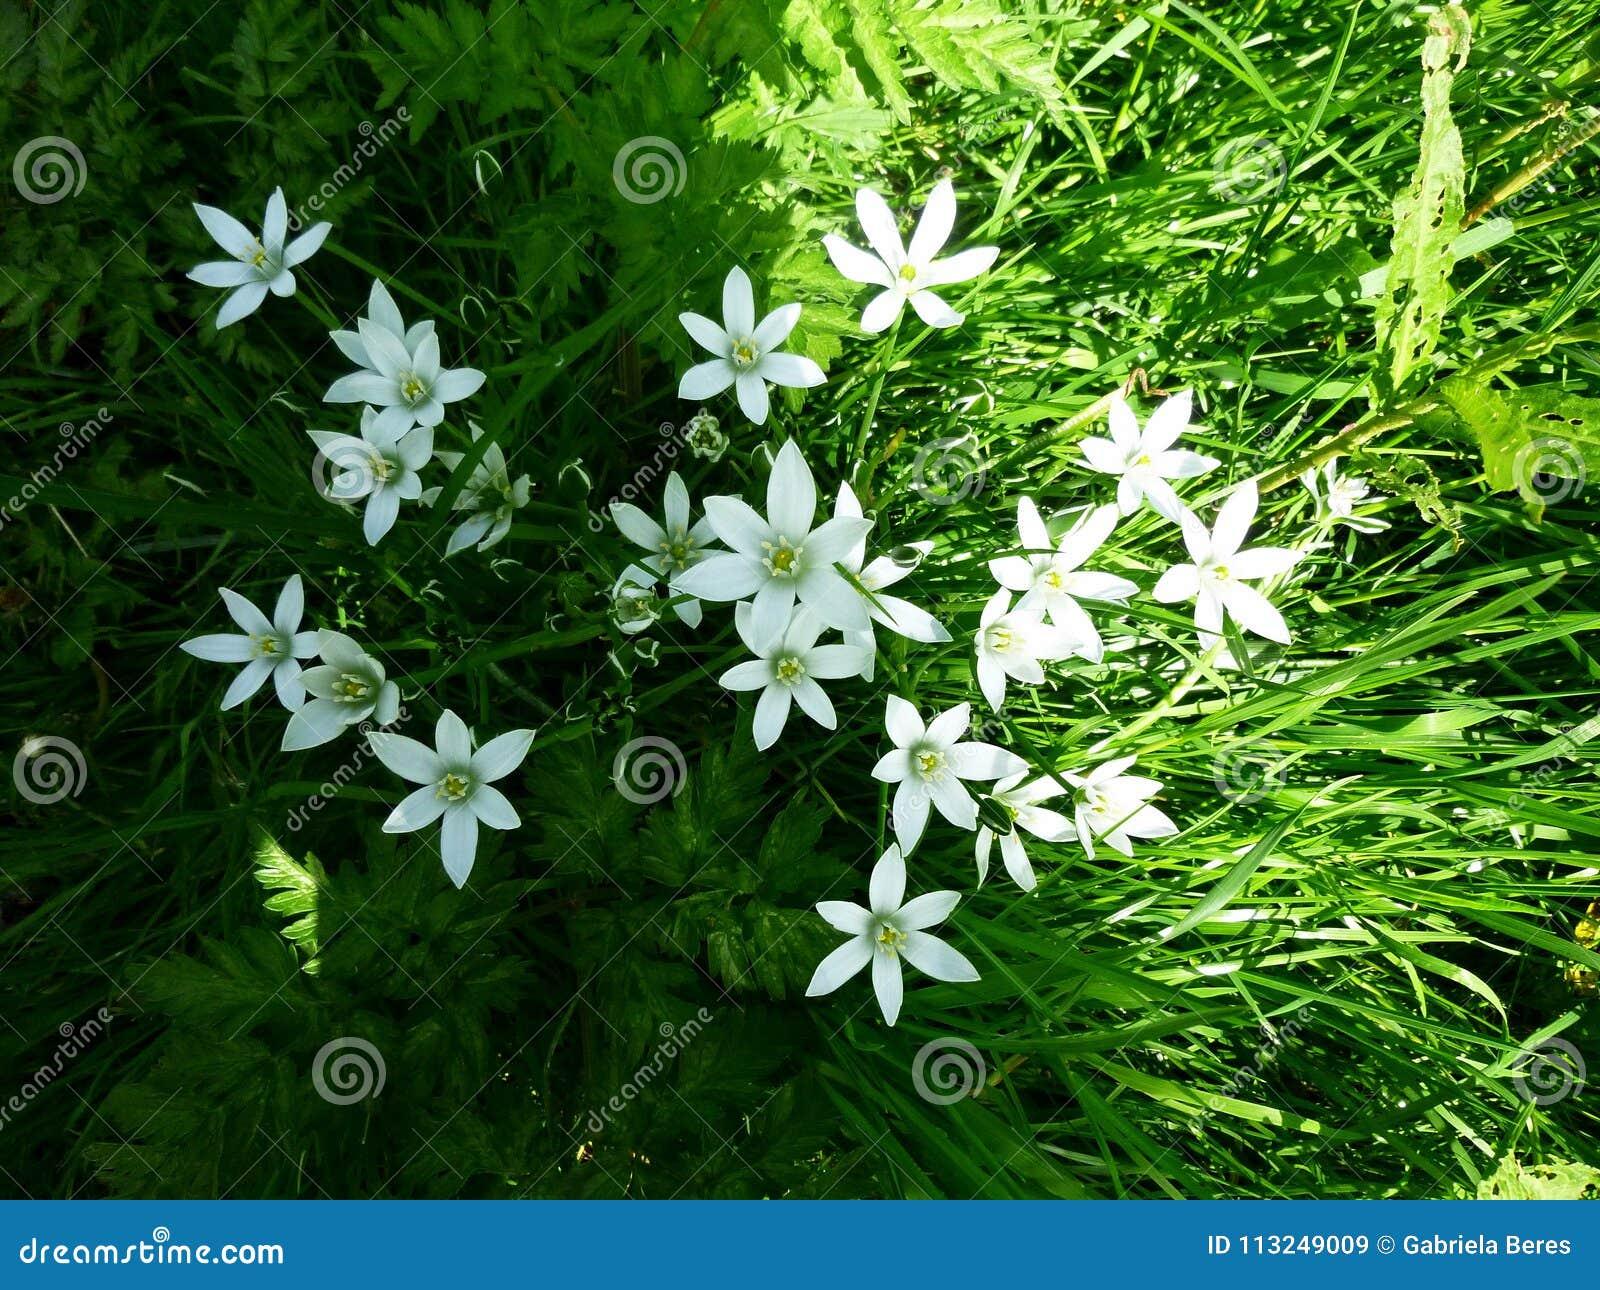 Ornithogalum Umbellatum Six Petal Flower Star Of Bethlehem White